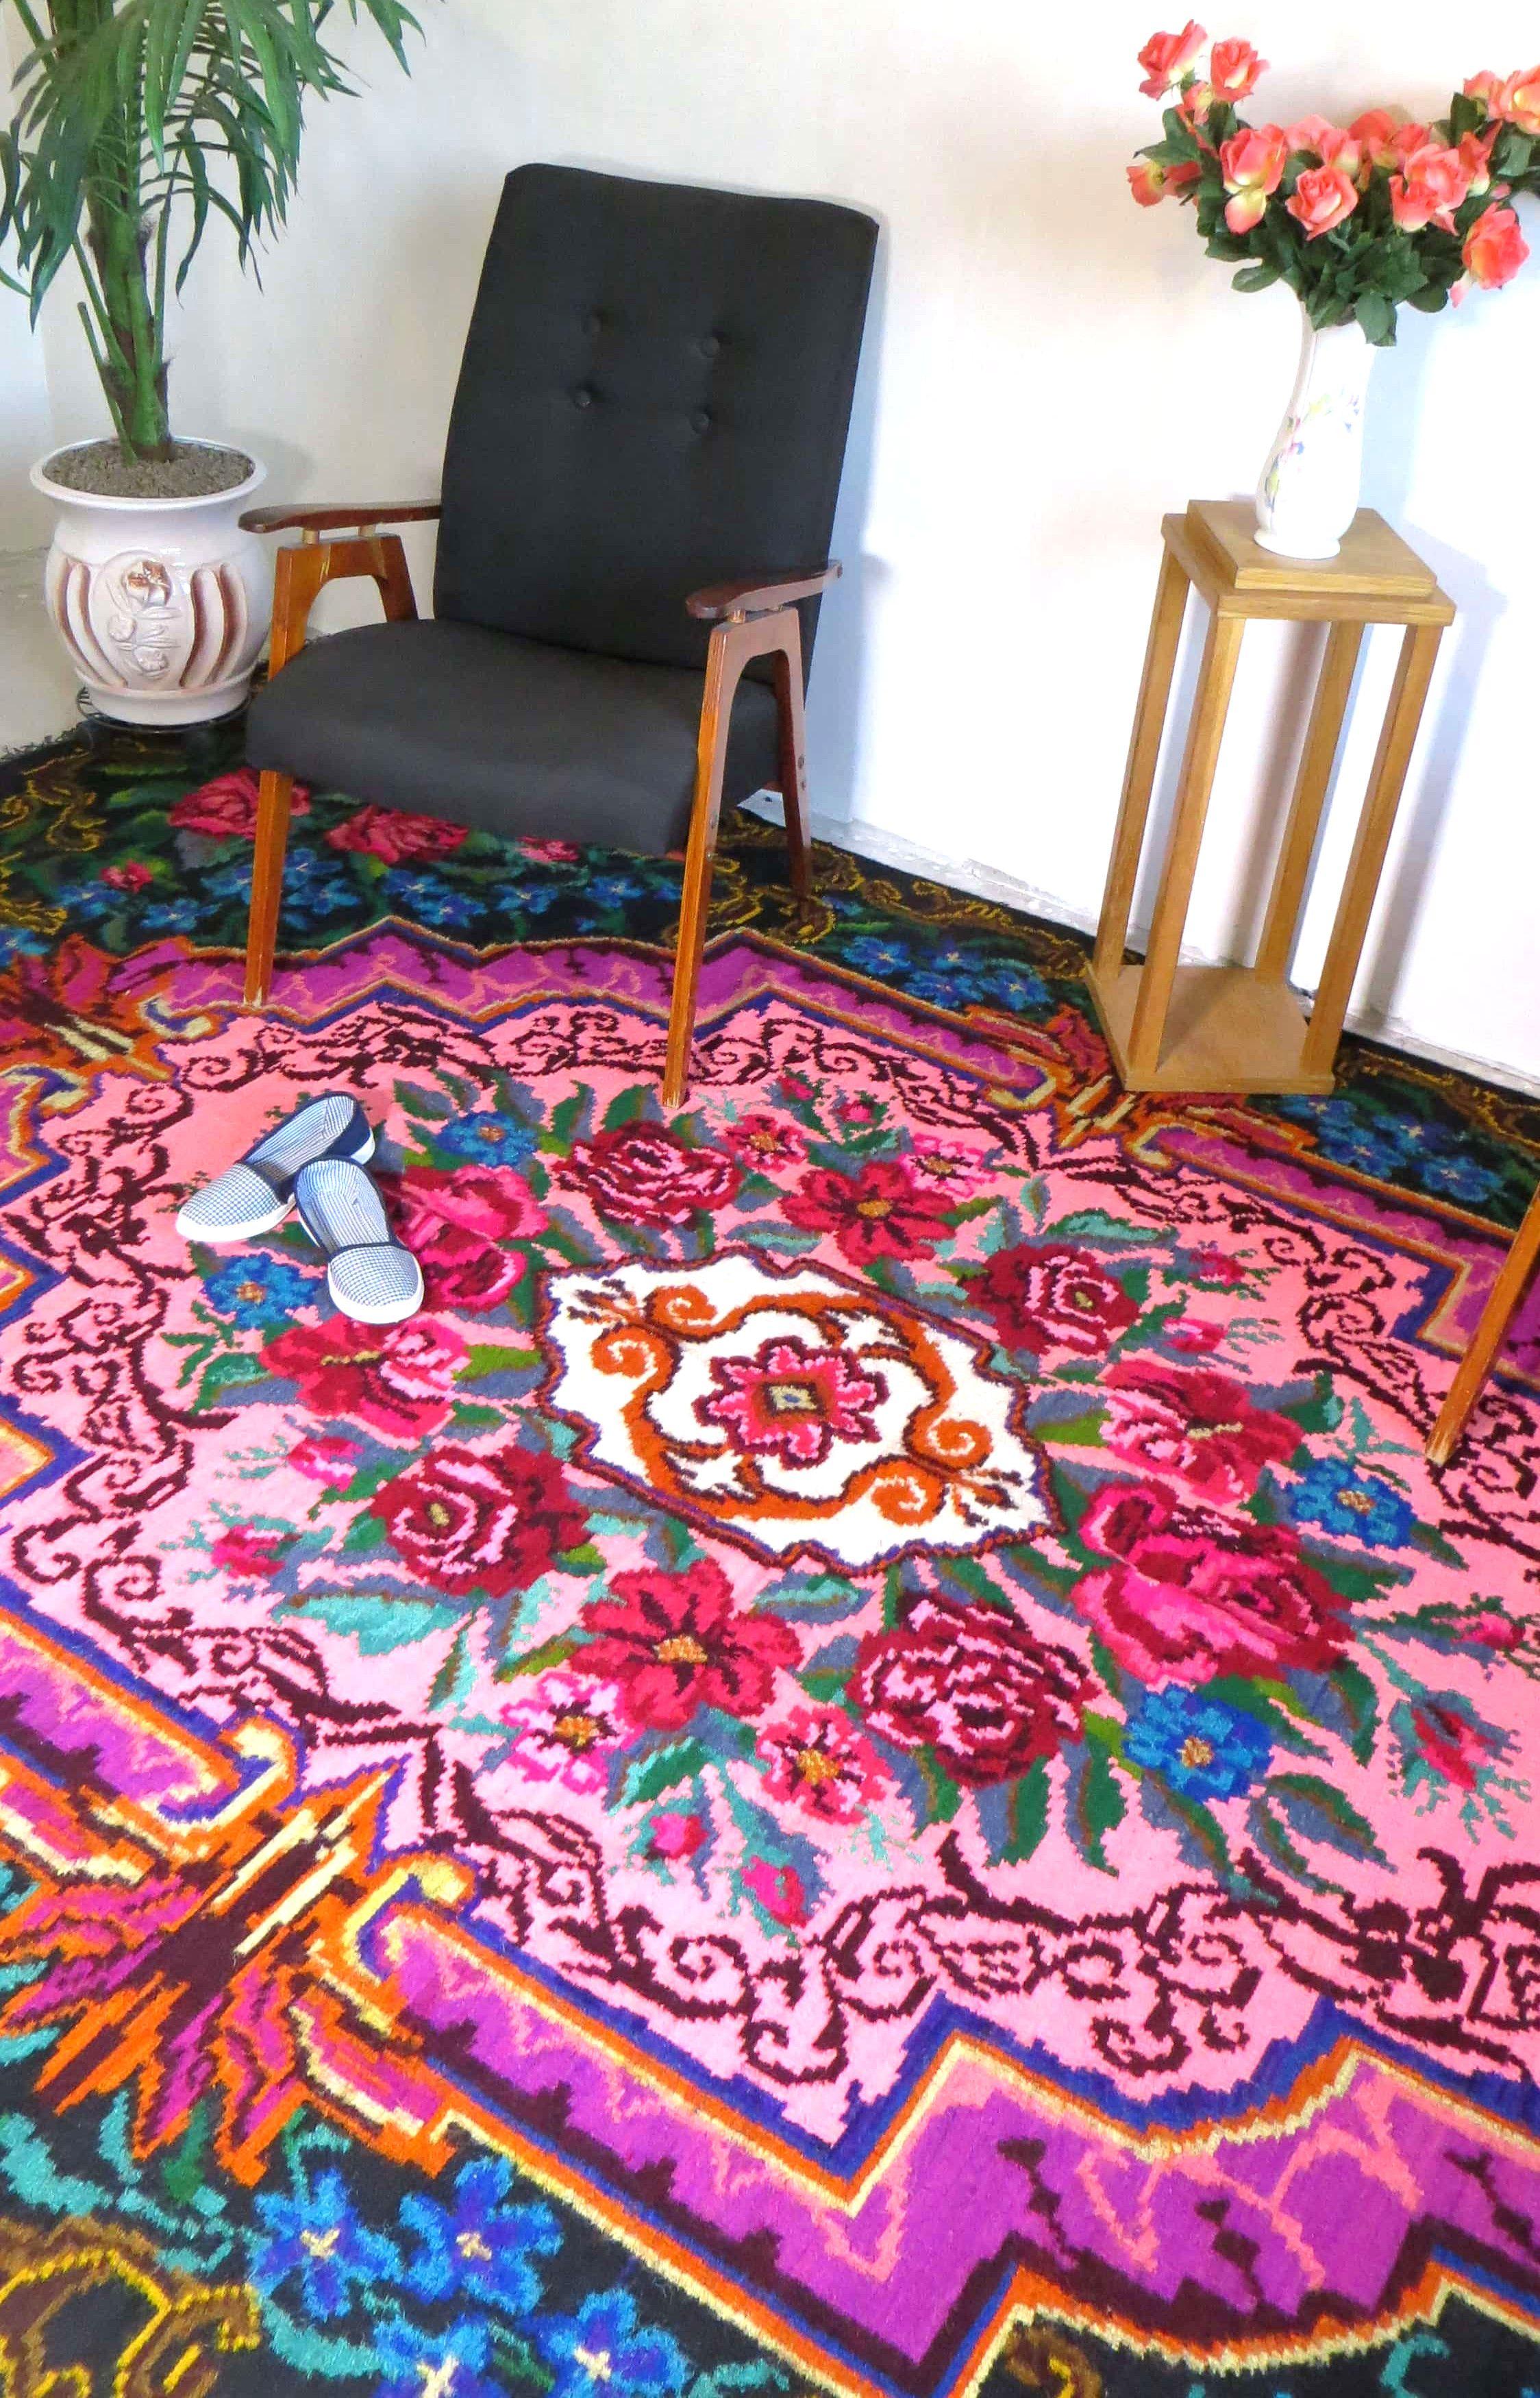 pink kilim rugs pink morrocan rugs pink vintage rugs pink turkish